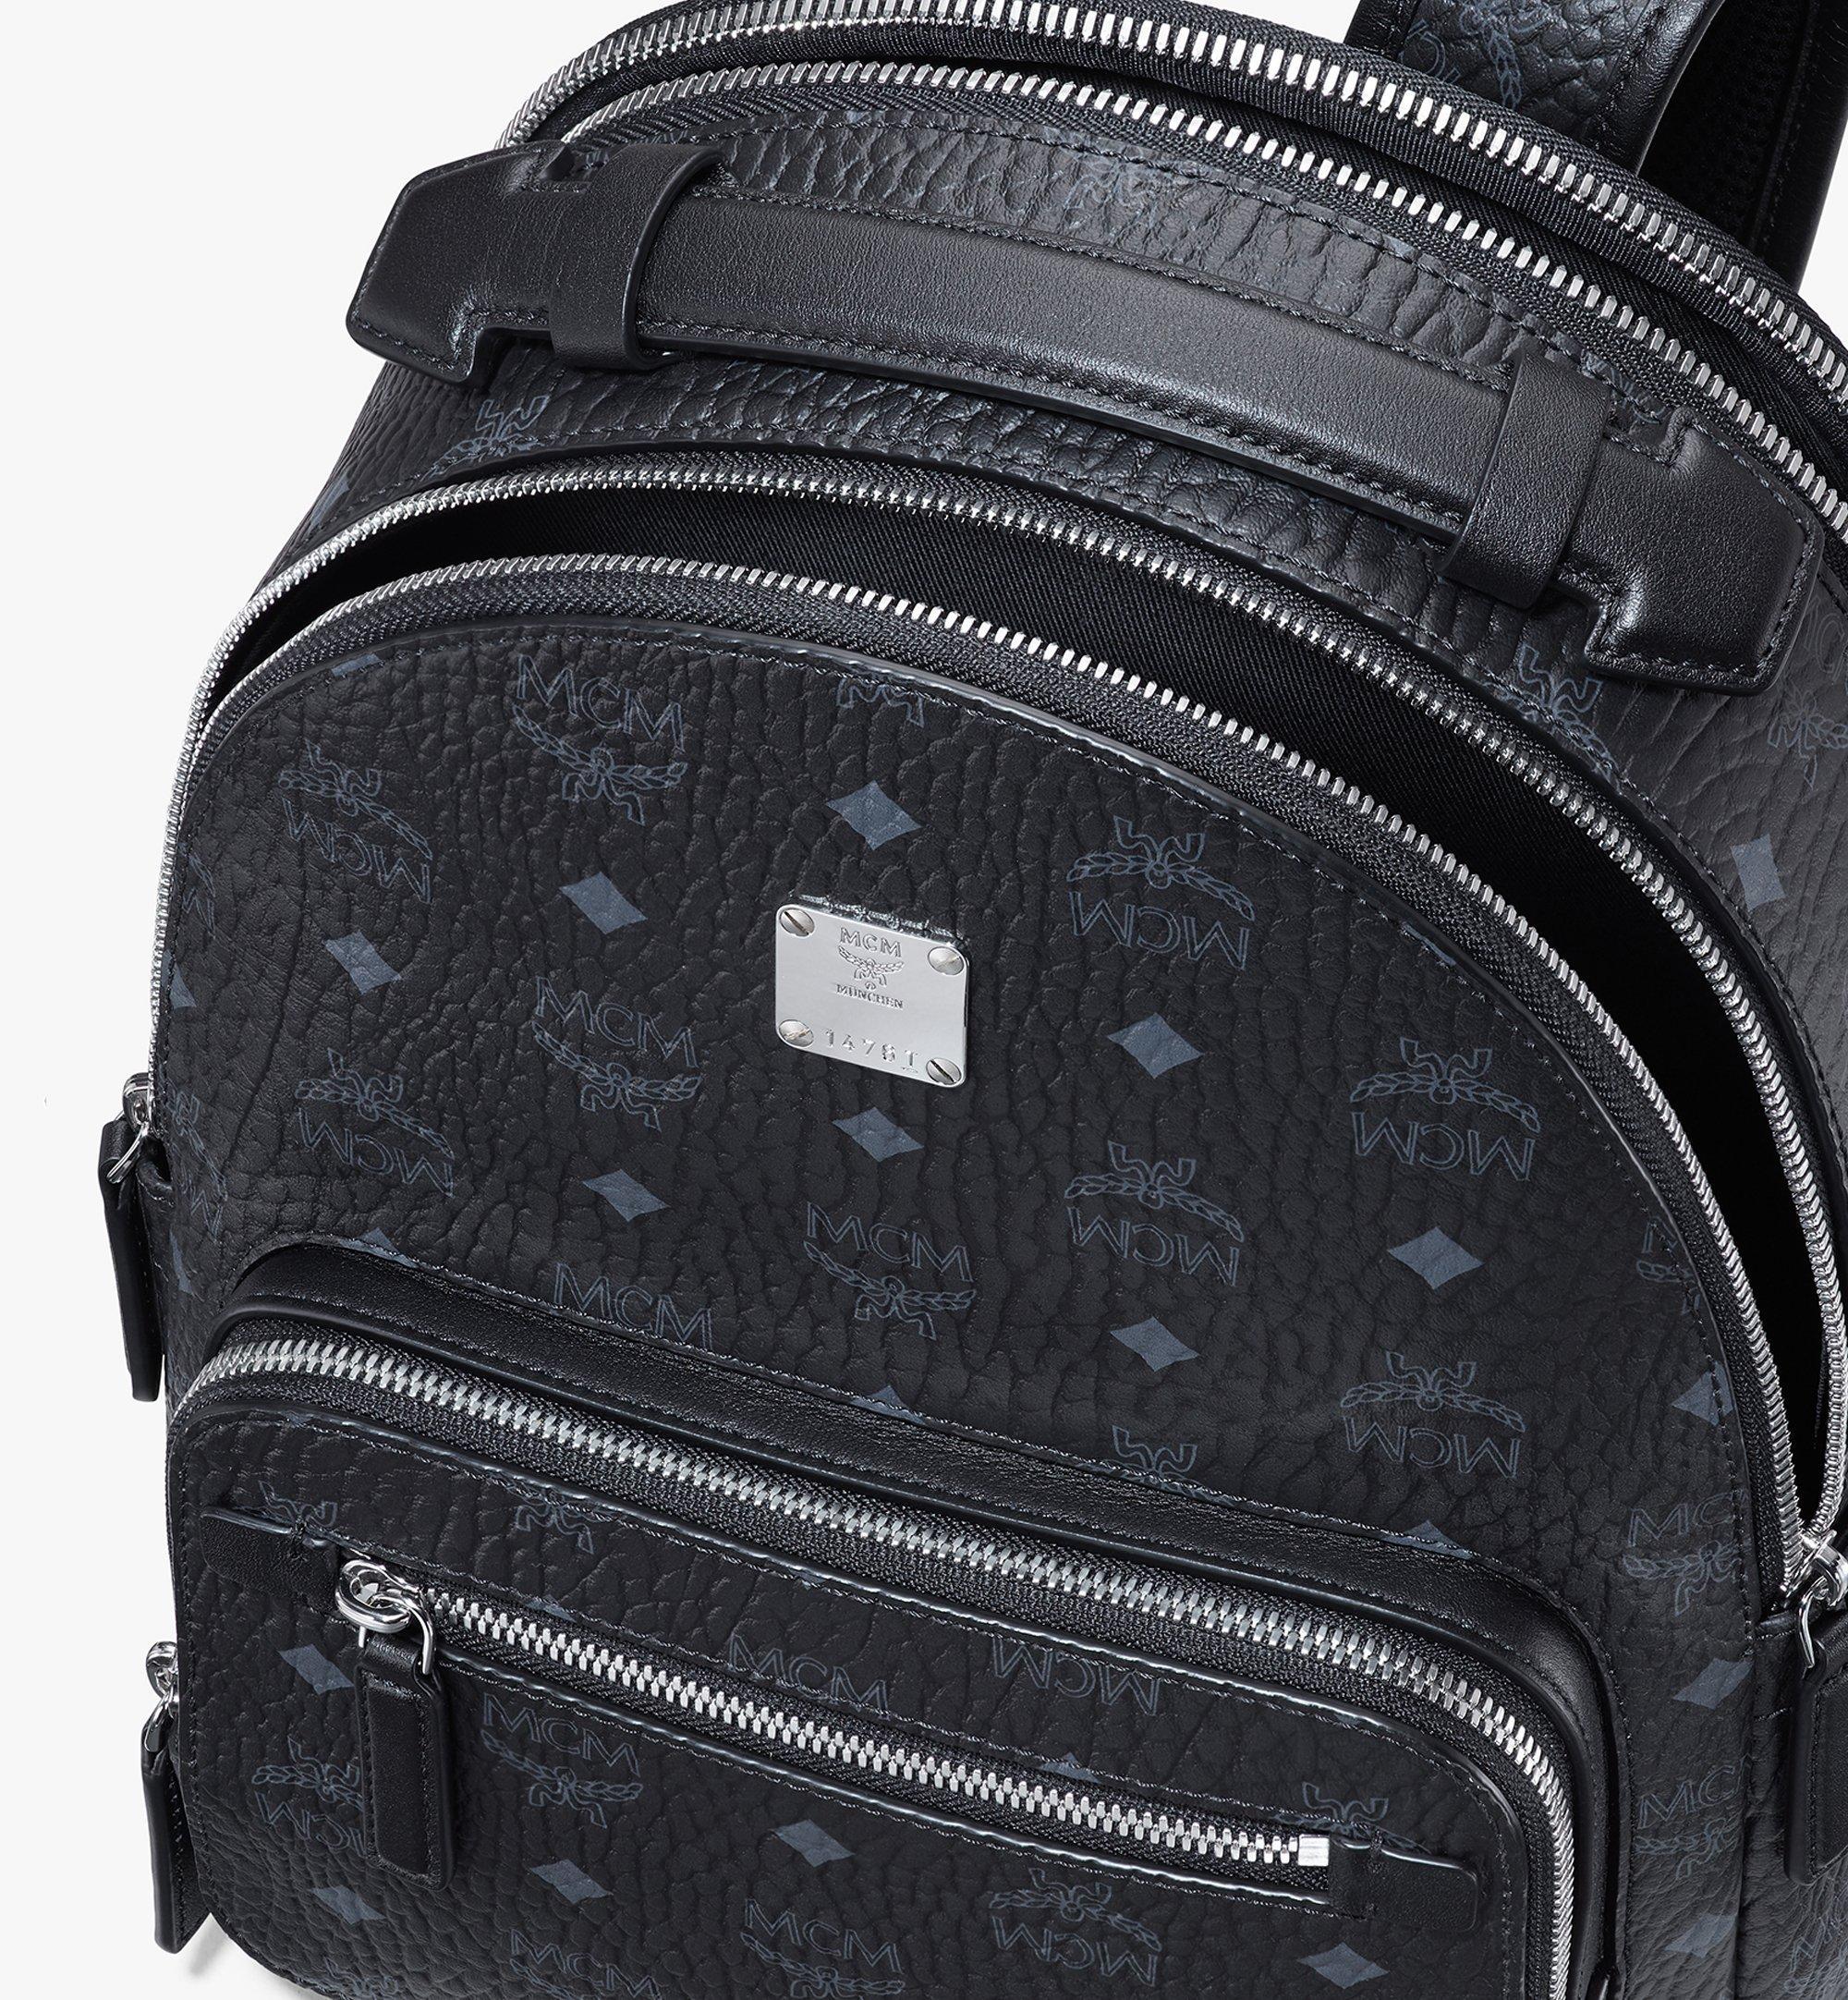 MCM Stark Backpack in Visetos Black MMKASVE10BK001 Alternate View 4